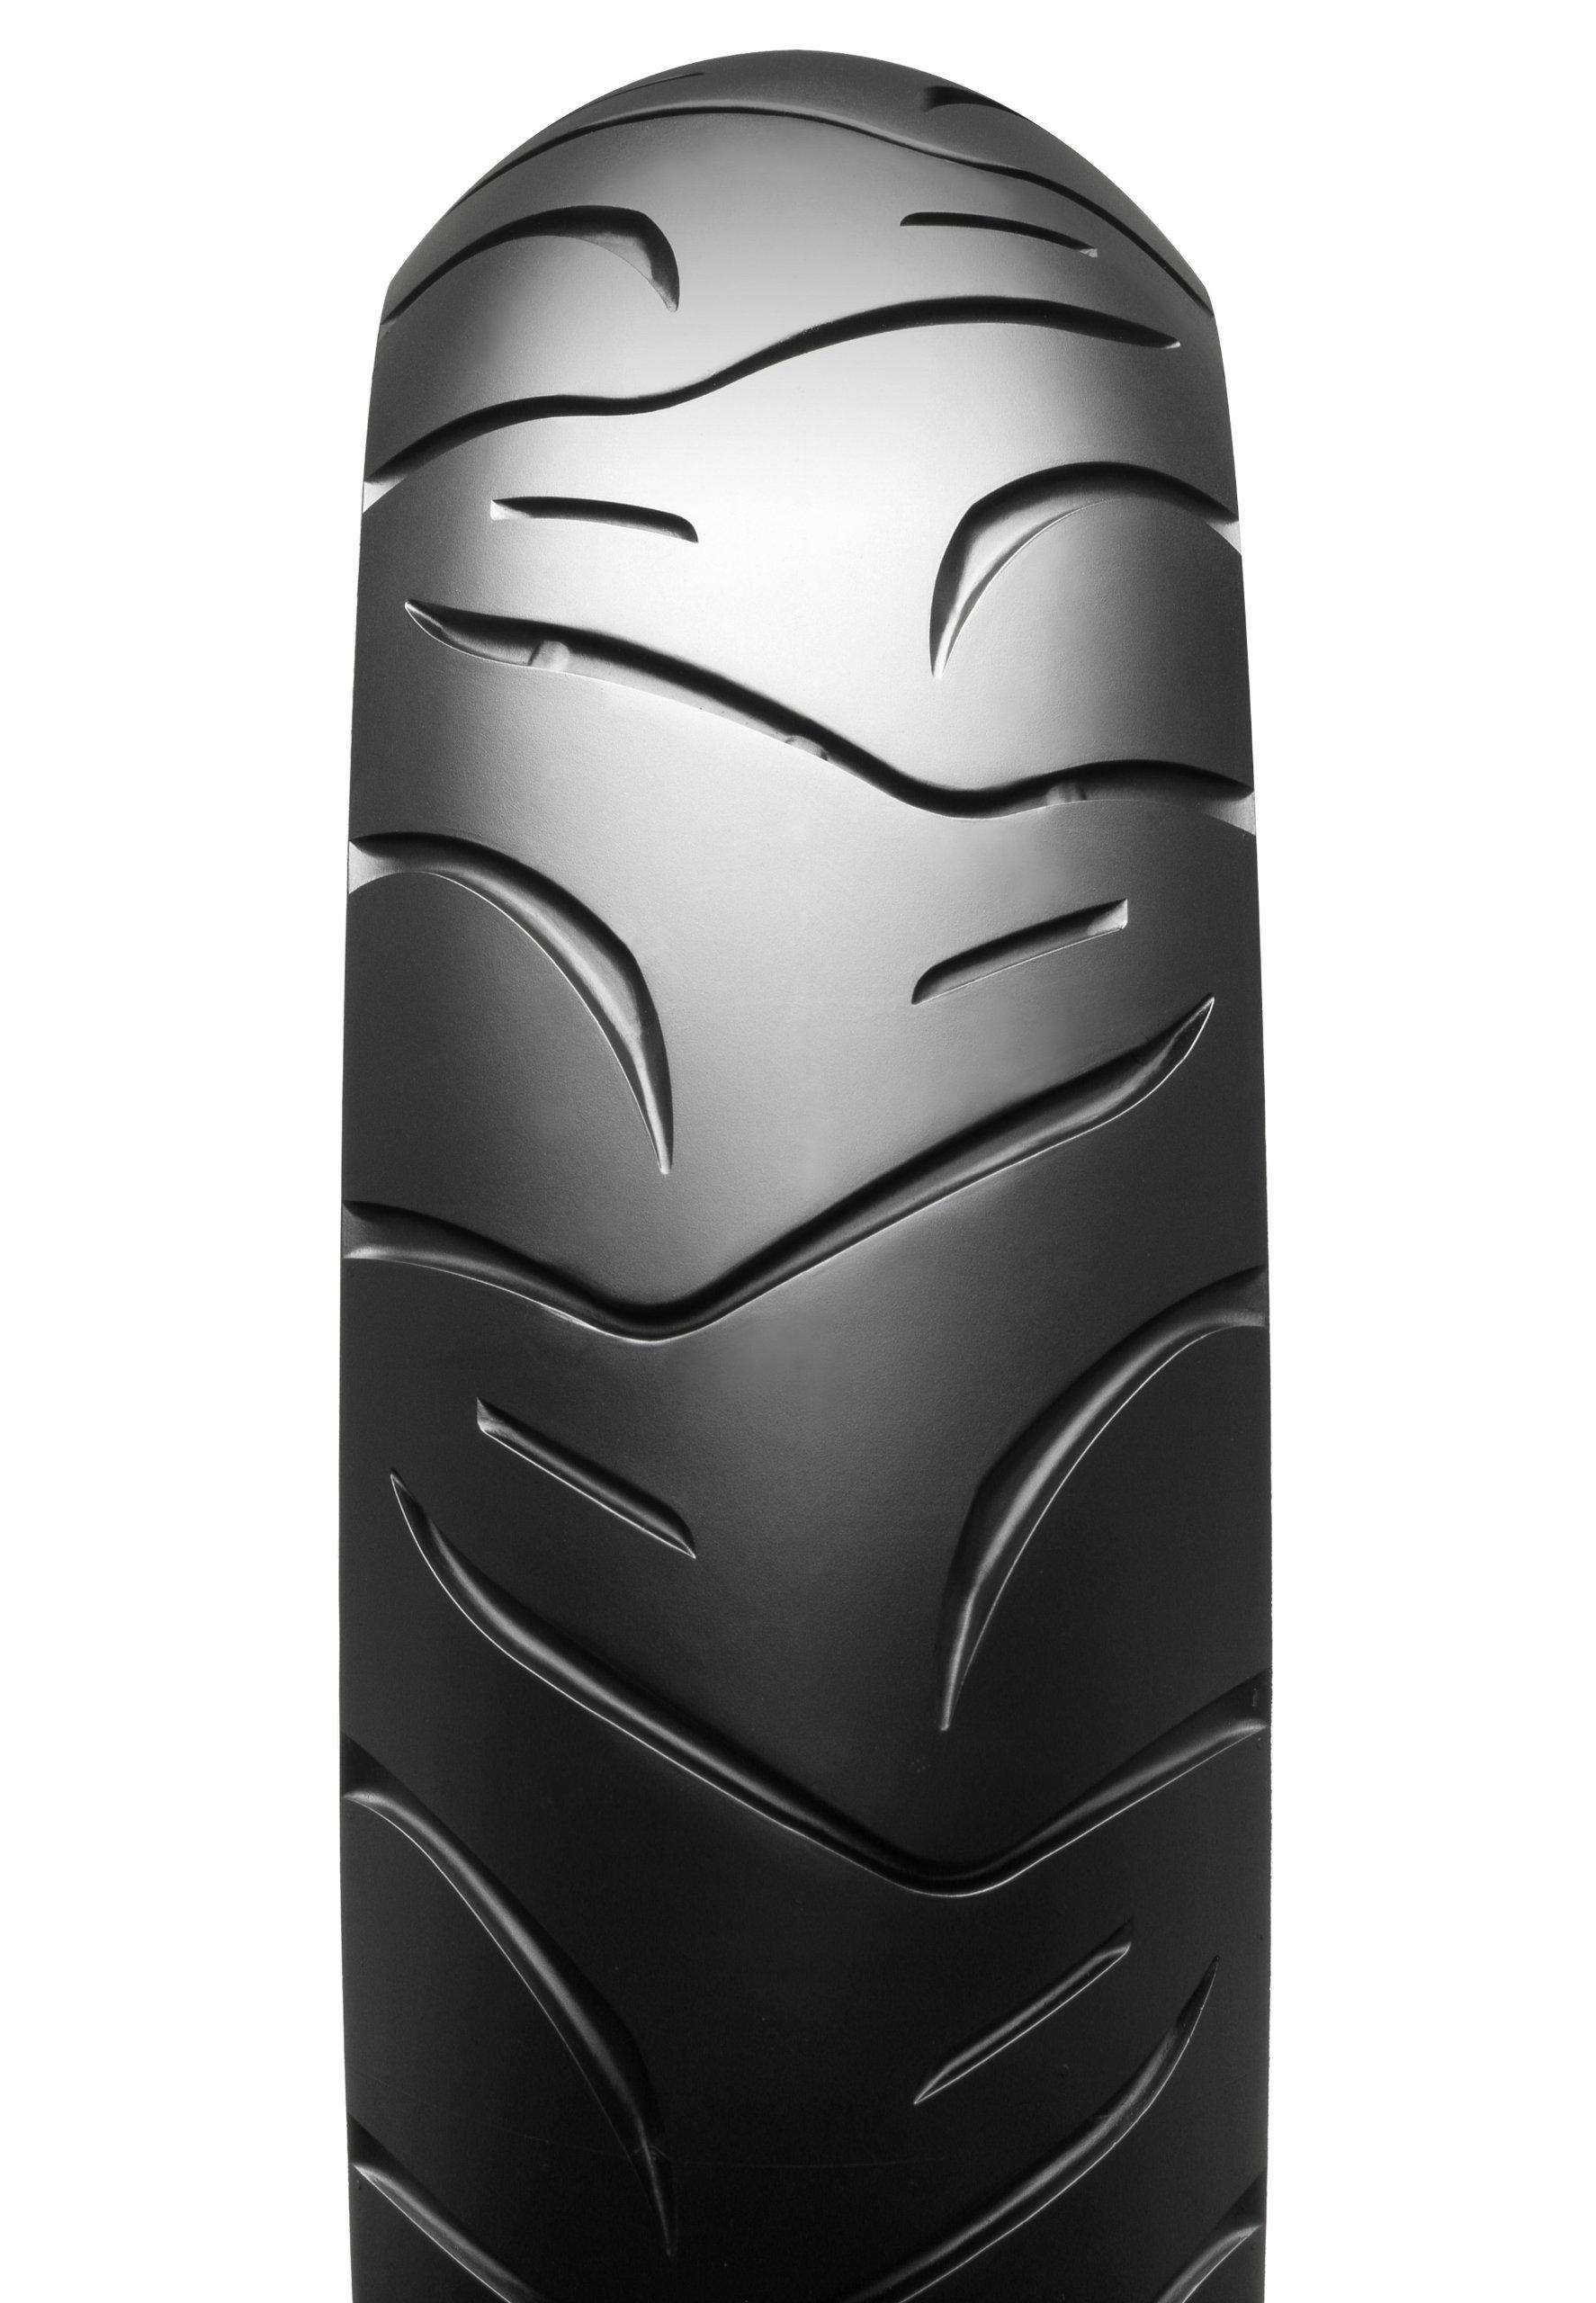 Bridgestone Excedra G850 Cruiser Rear Motorcycle Tire 190/60-17